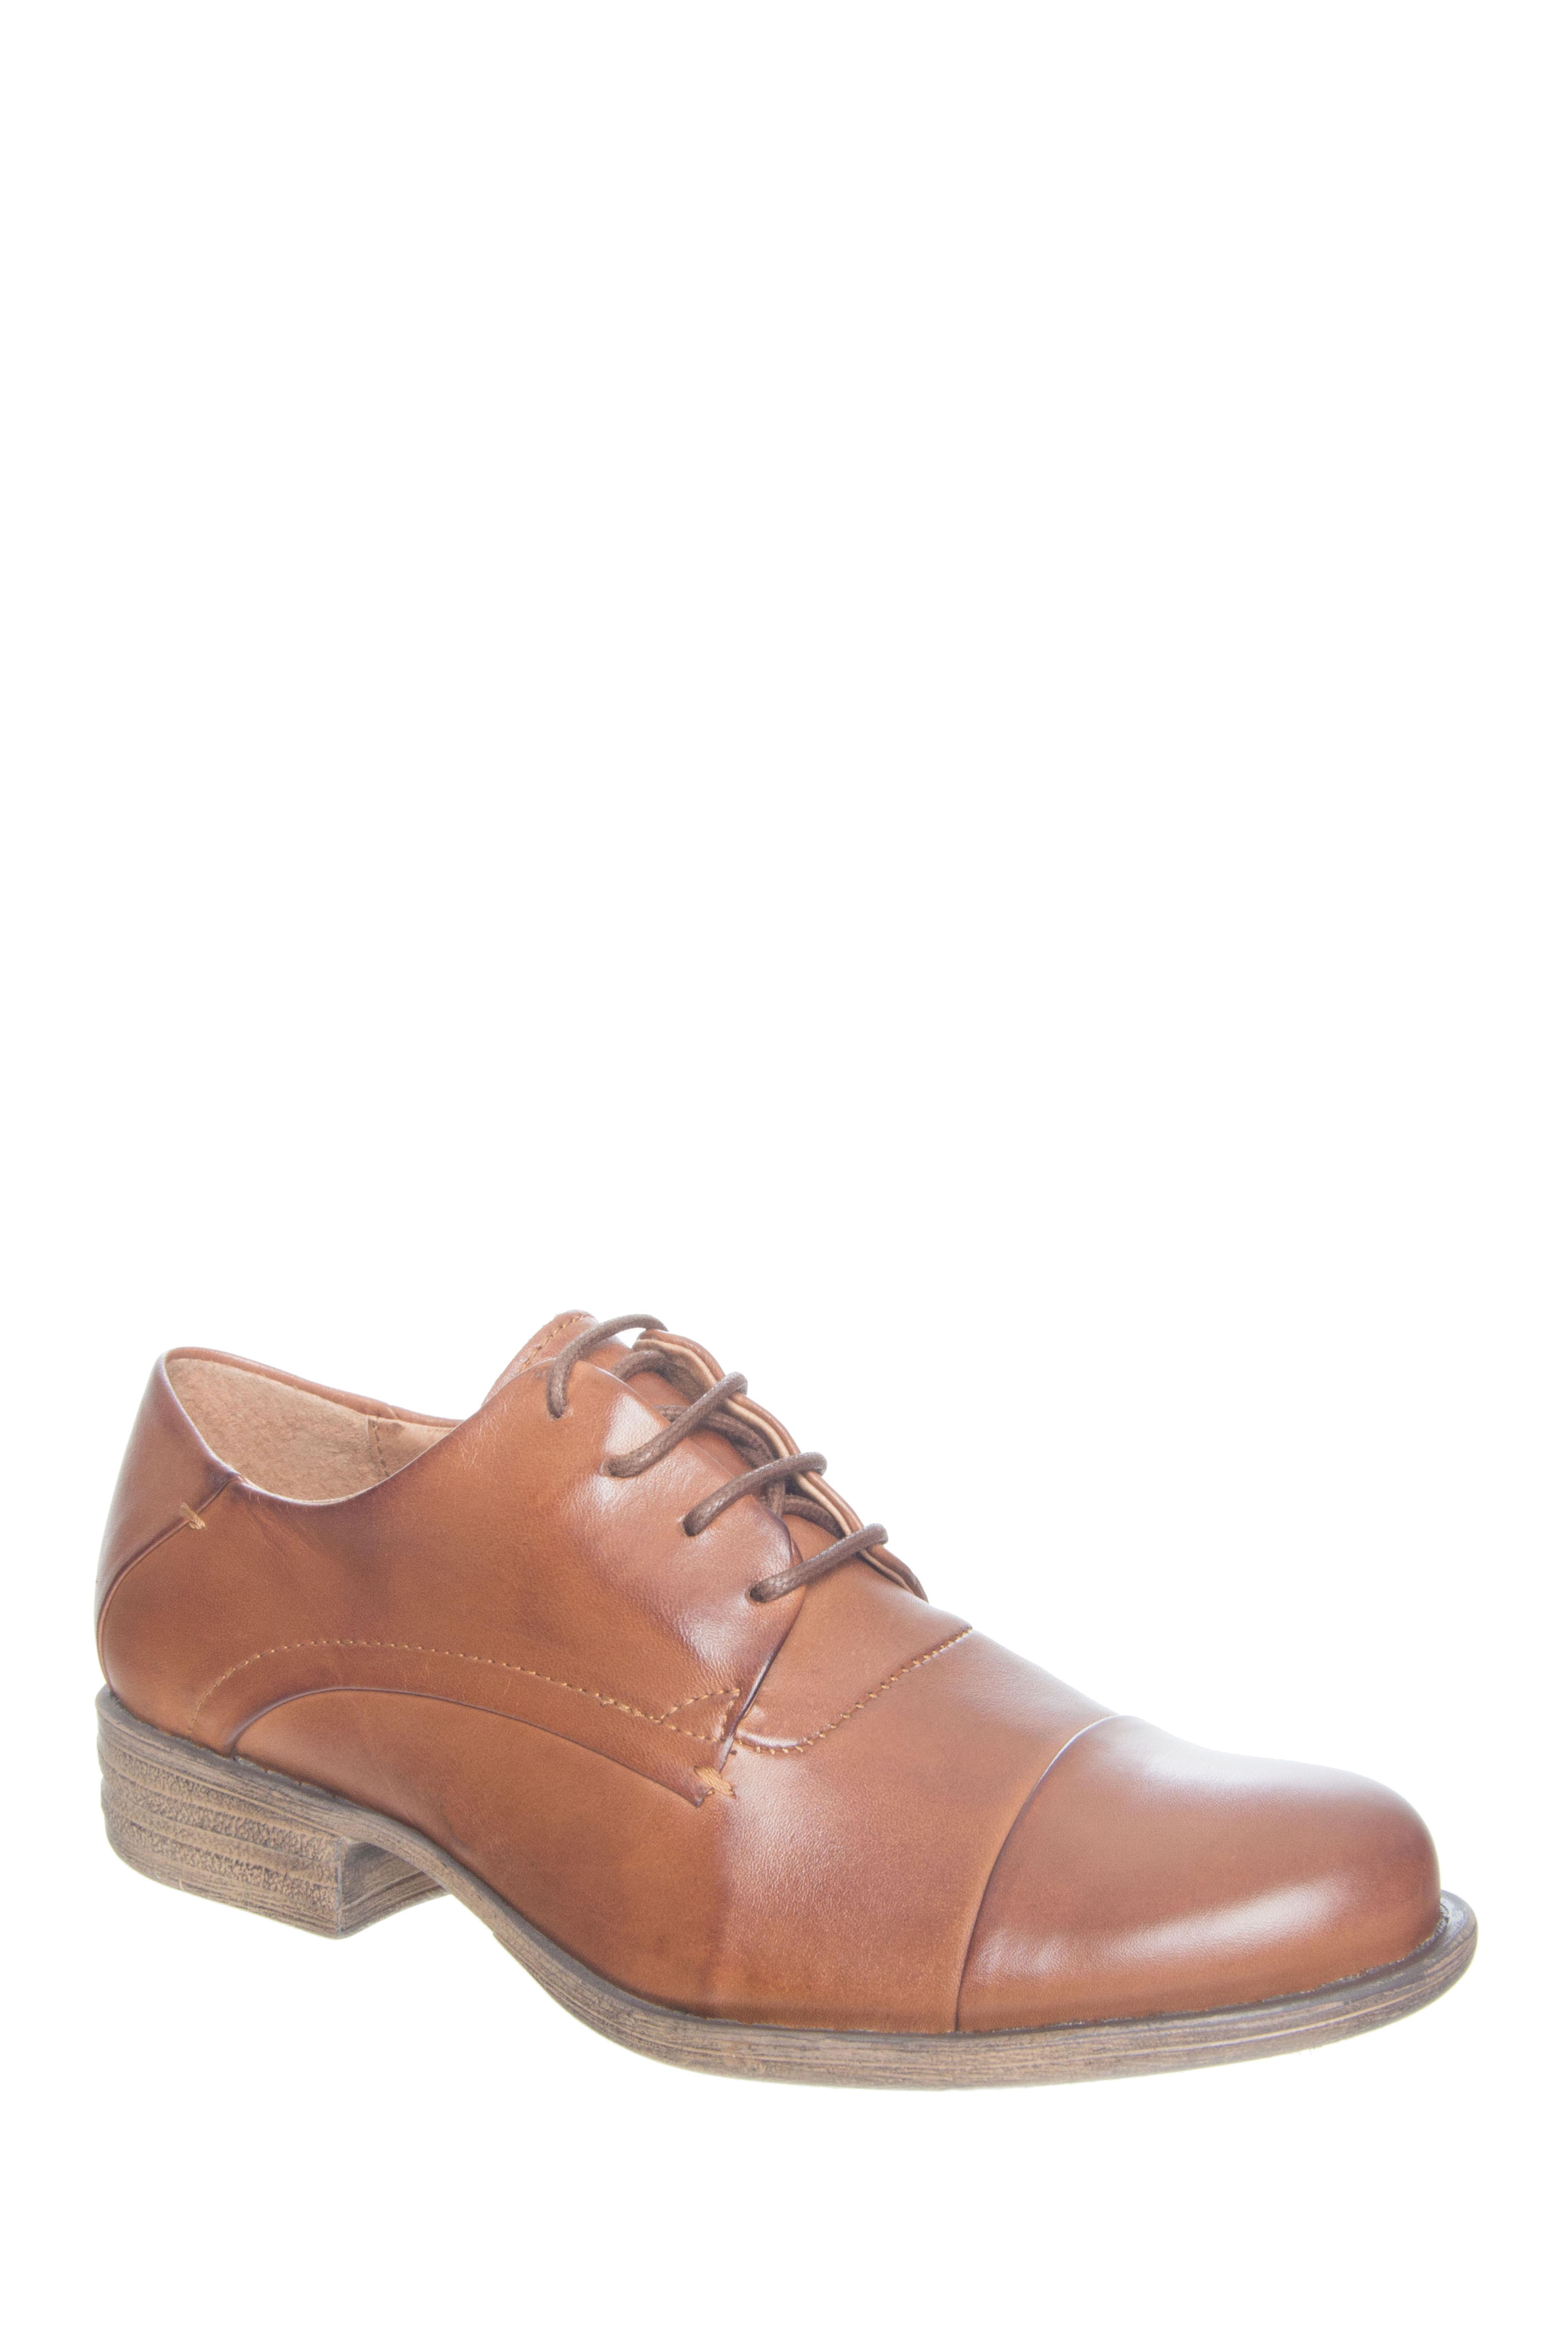 Miz Mooz Letty Low Heel Oxford - Brandy